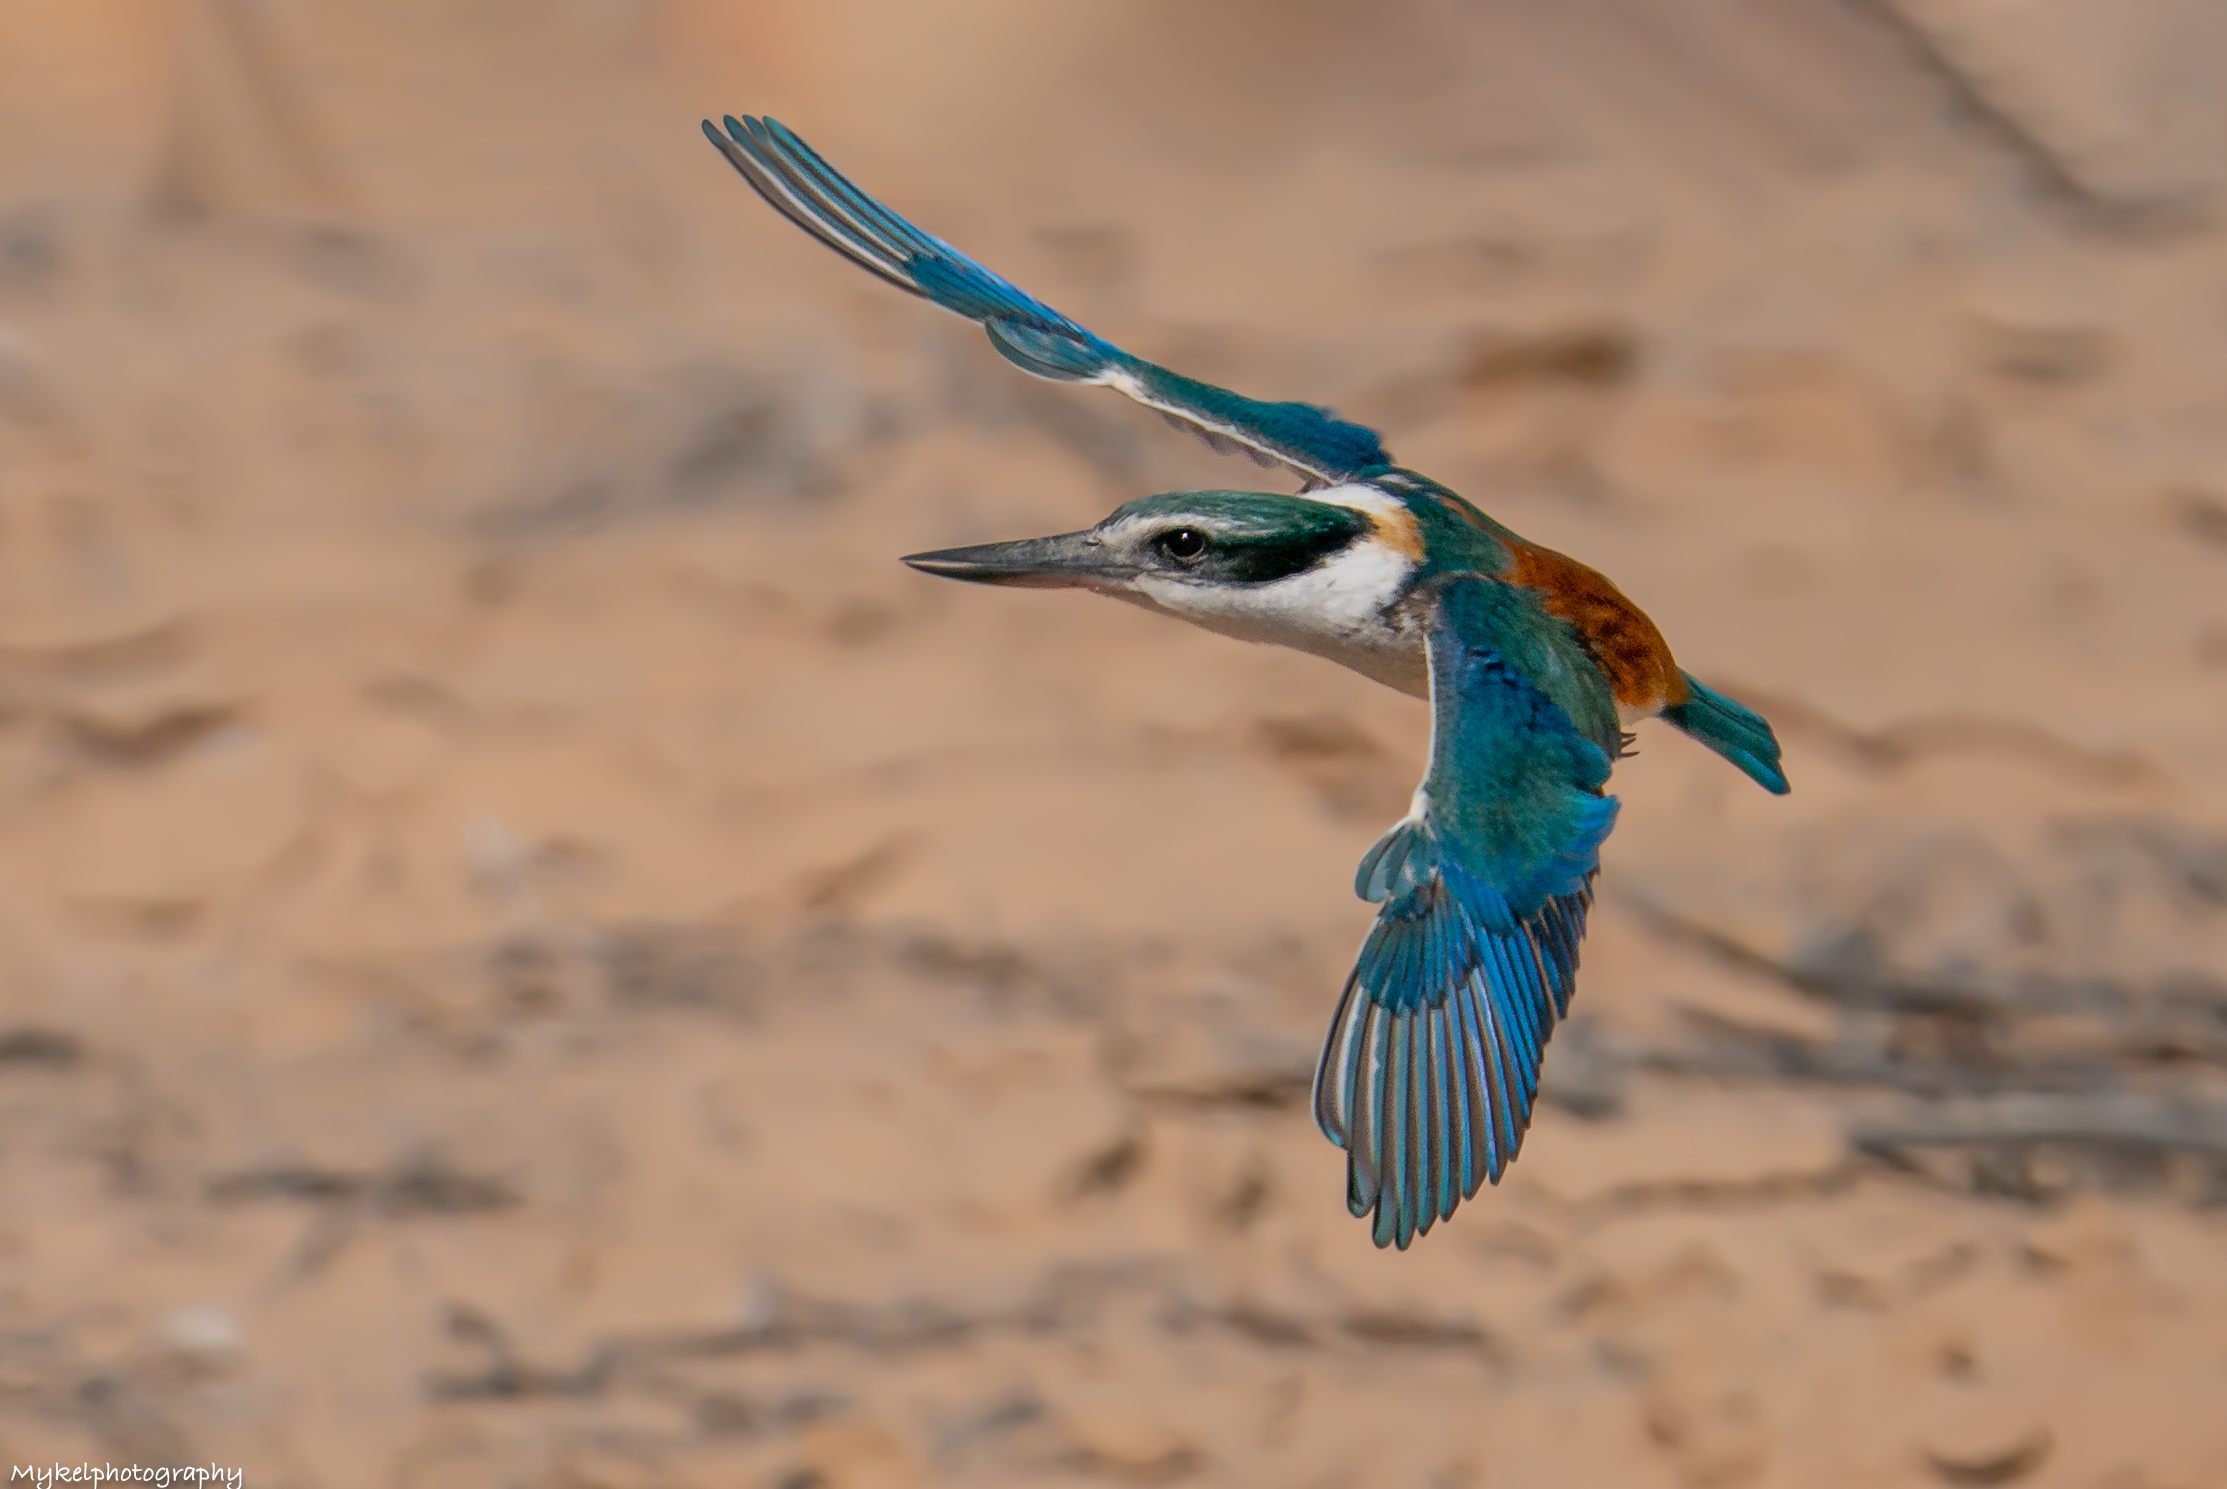 Red-backed Kingfisher  Todiramphus pyrrhopygius